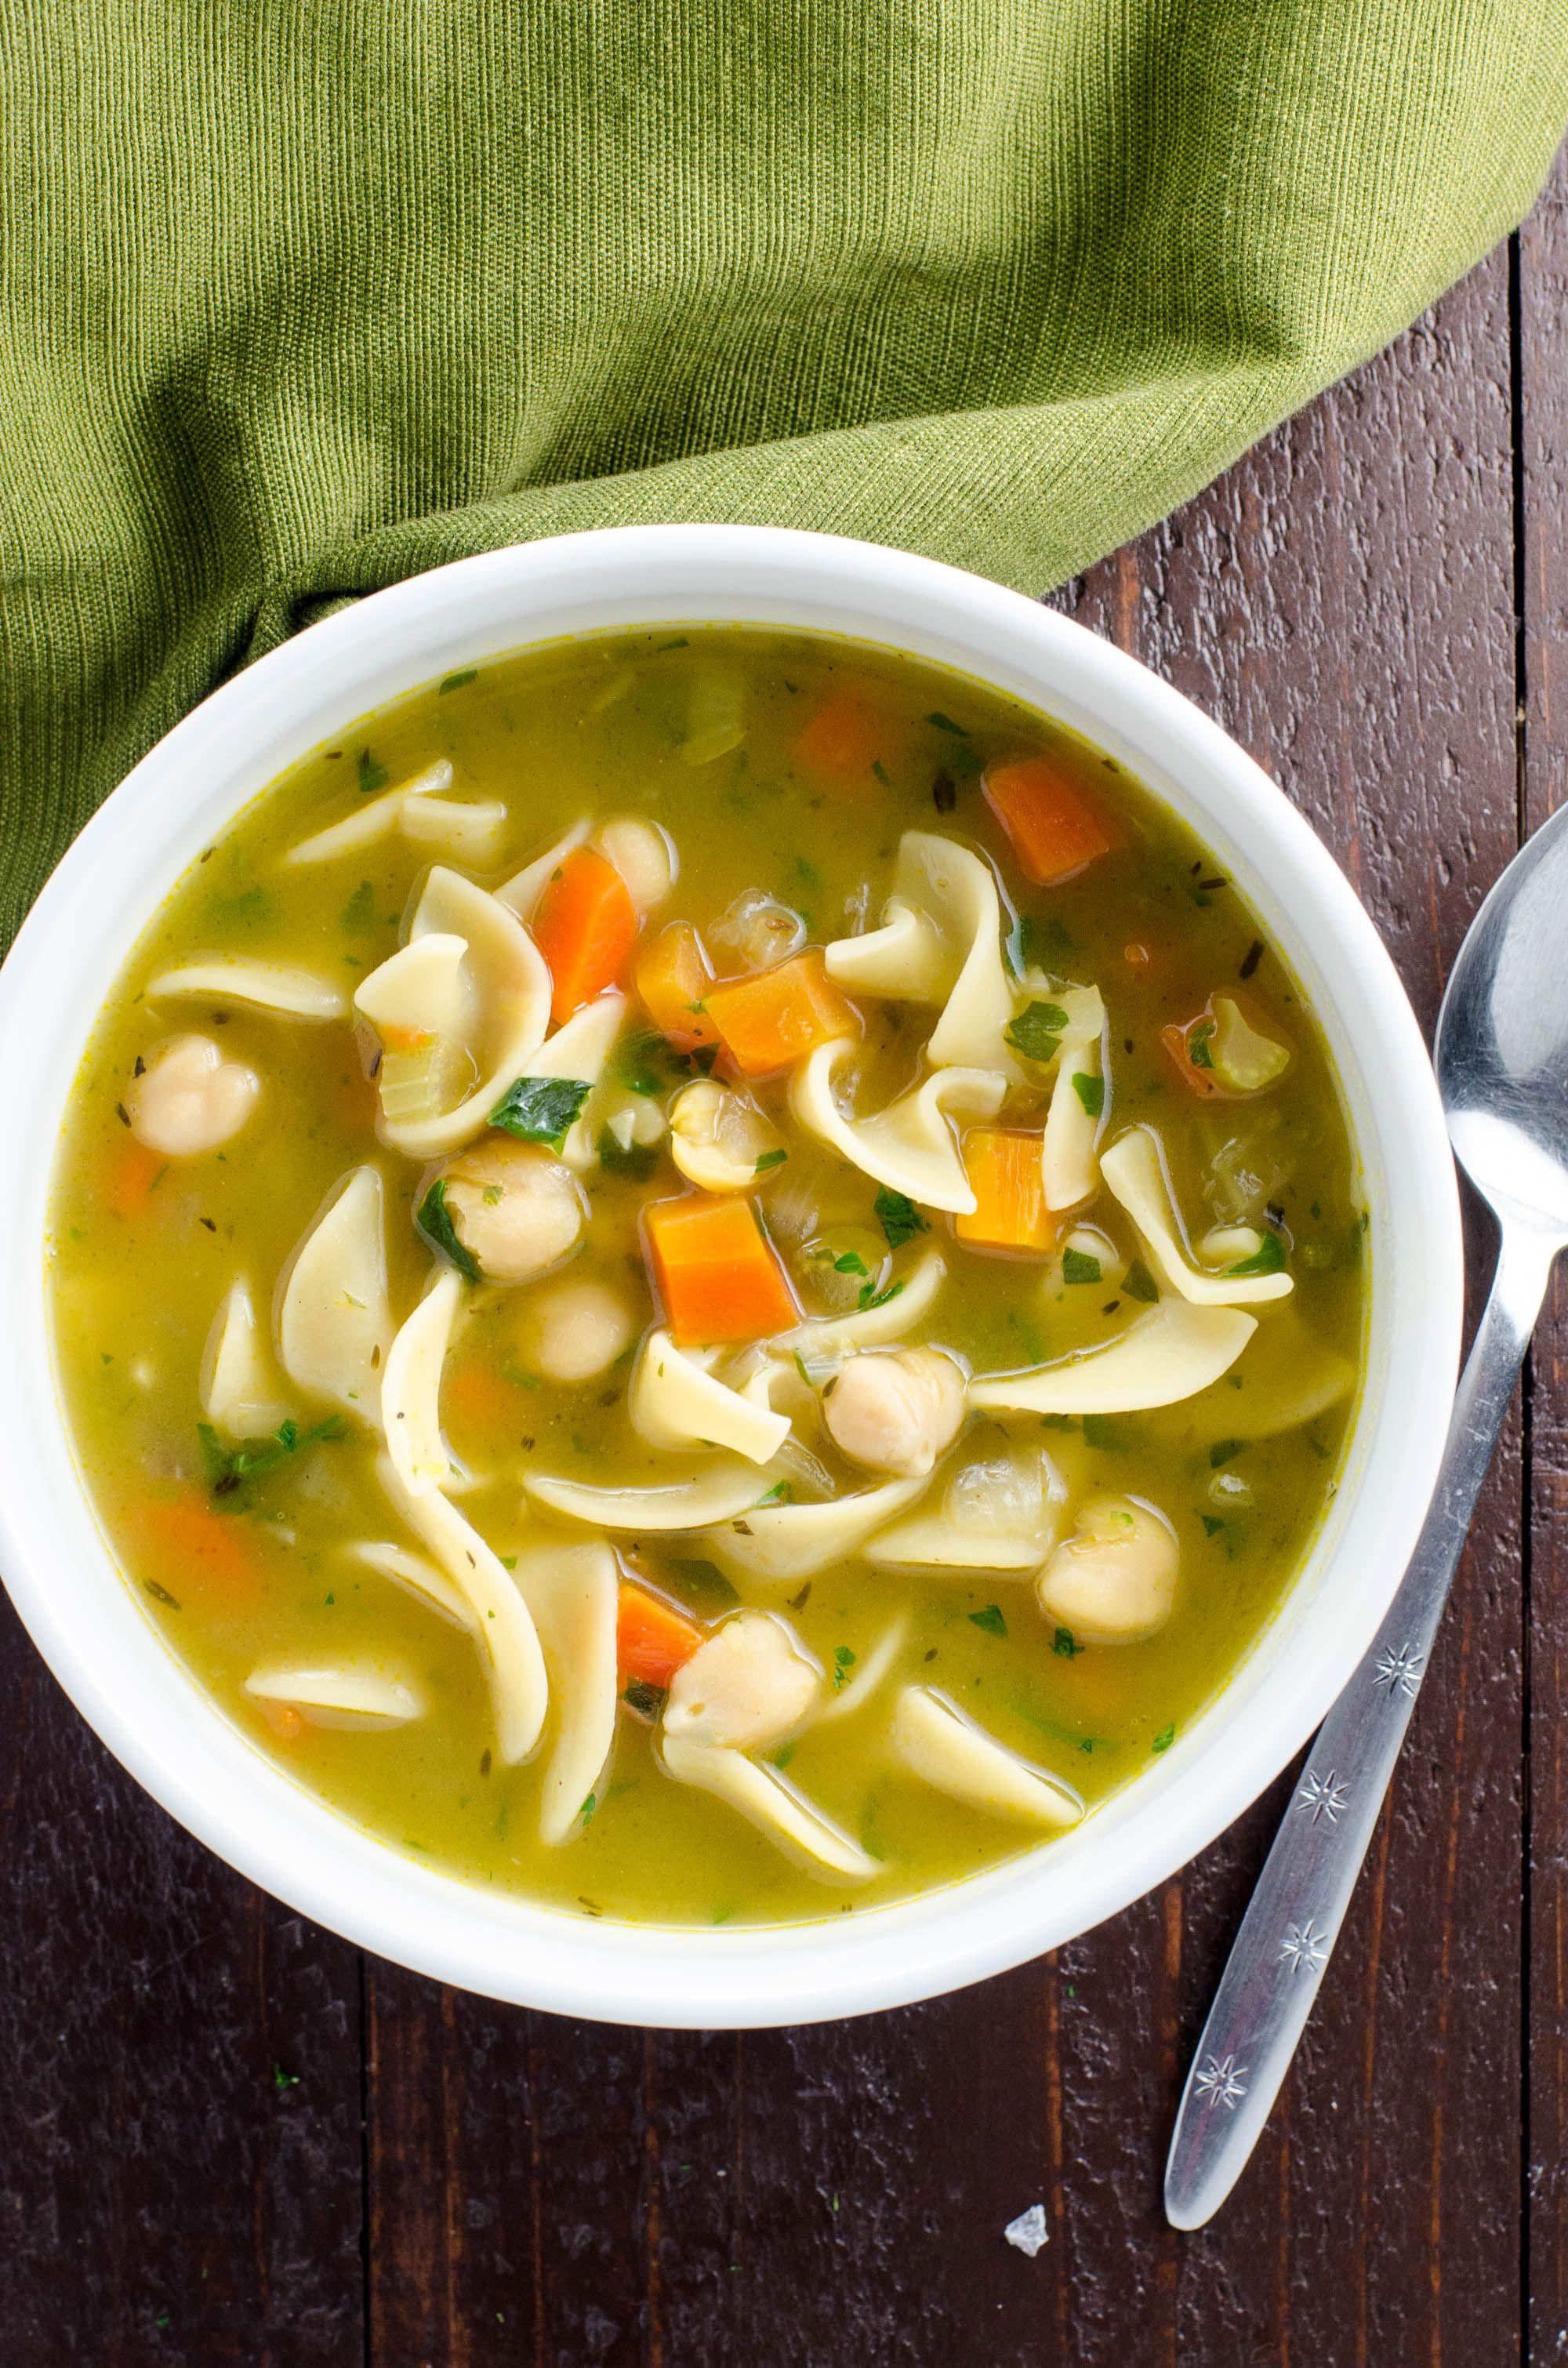 Chickpea Noodle Soup #chickpeanoodlesoup